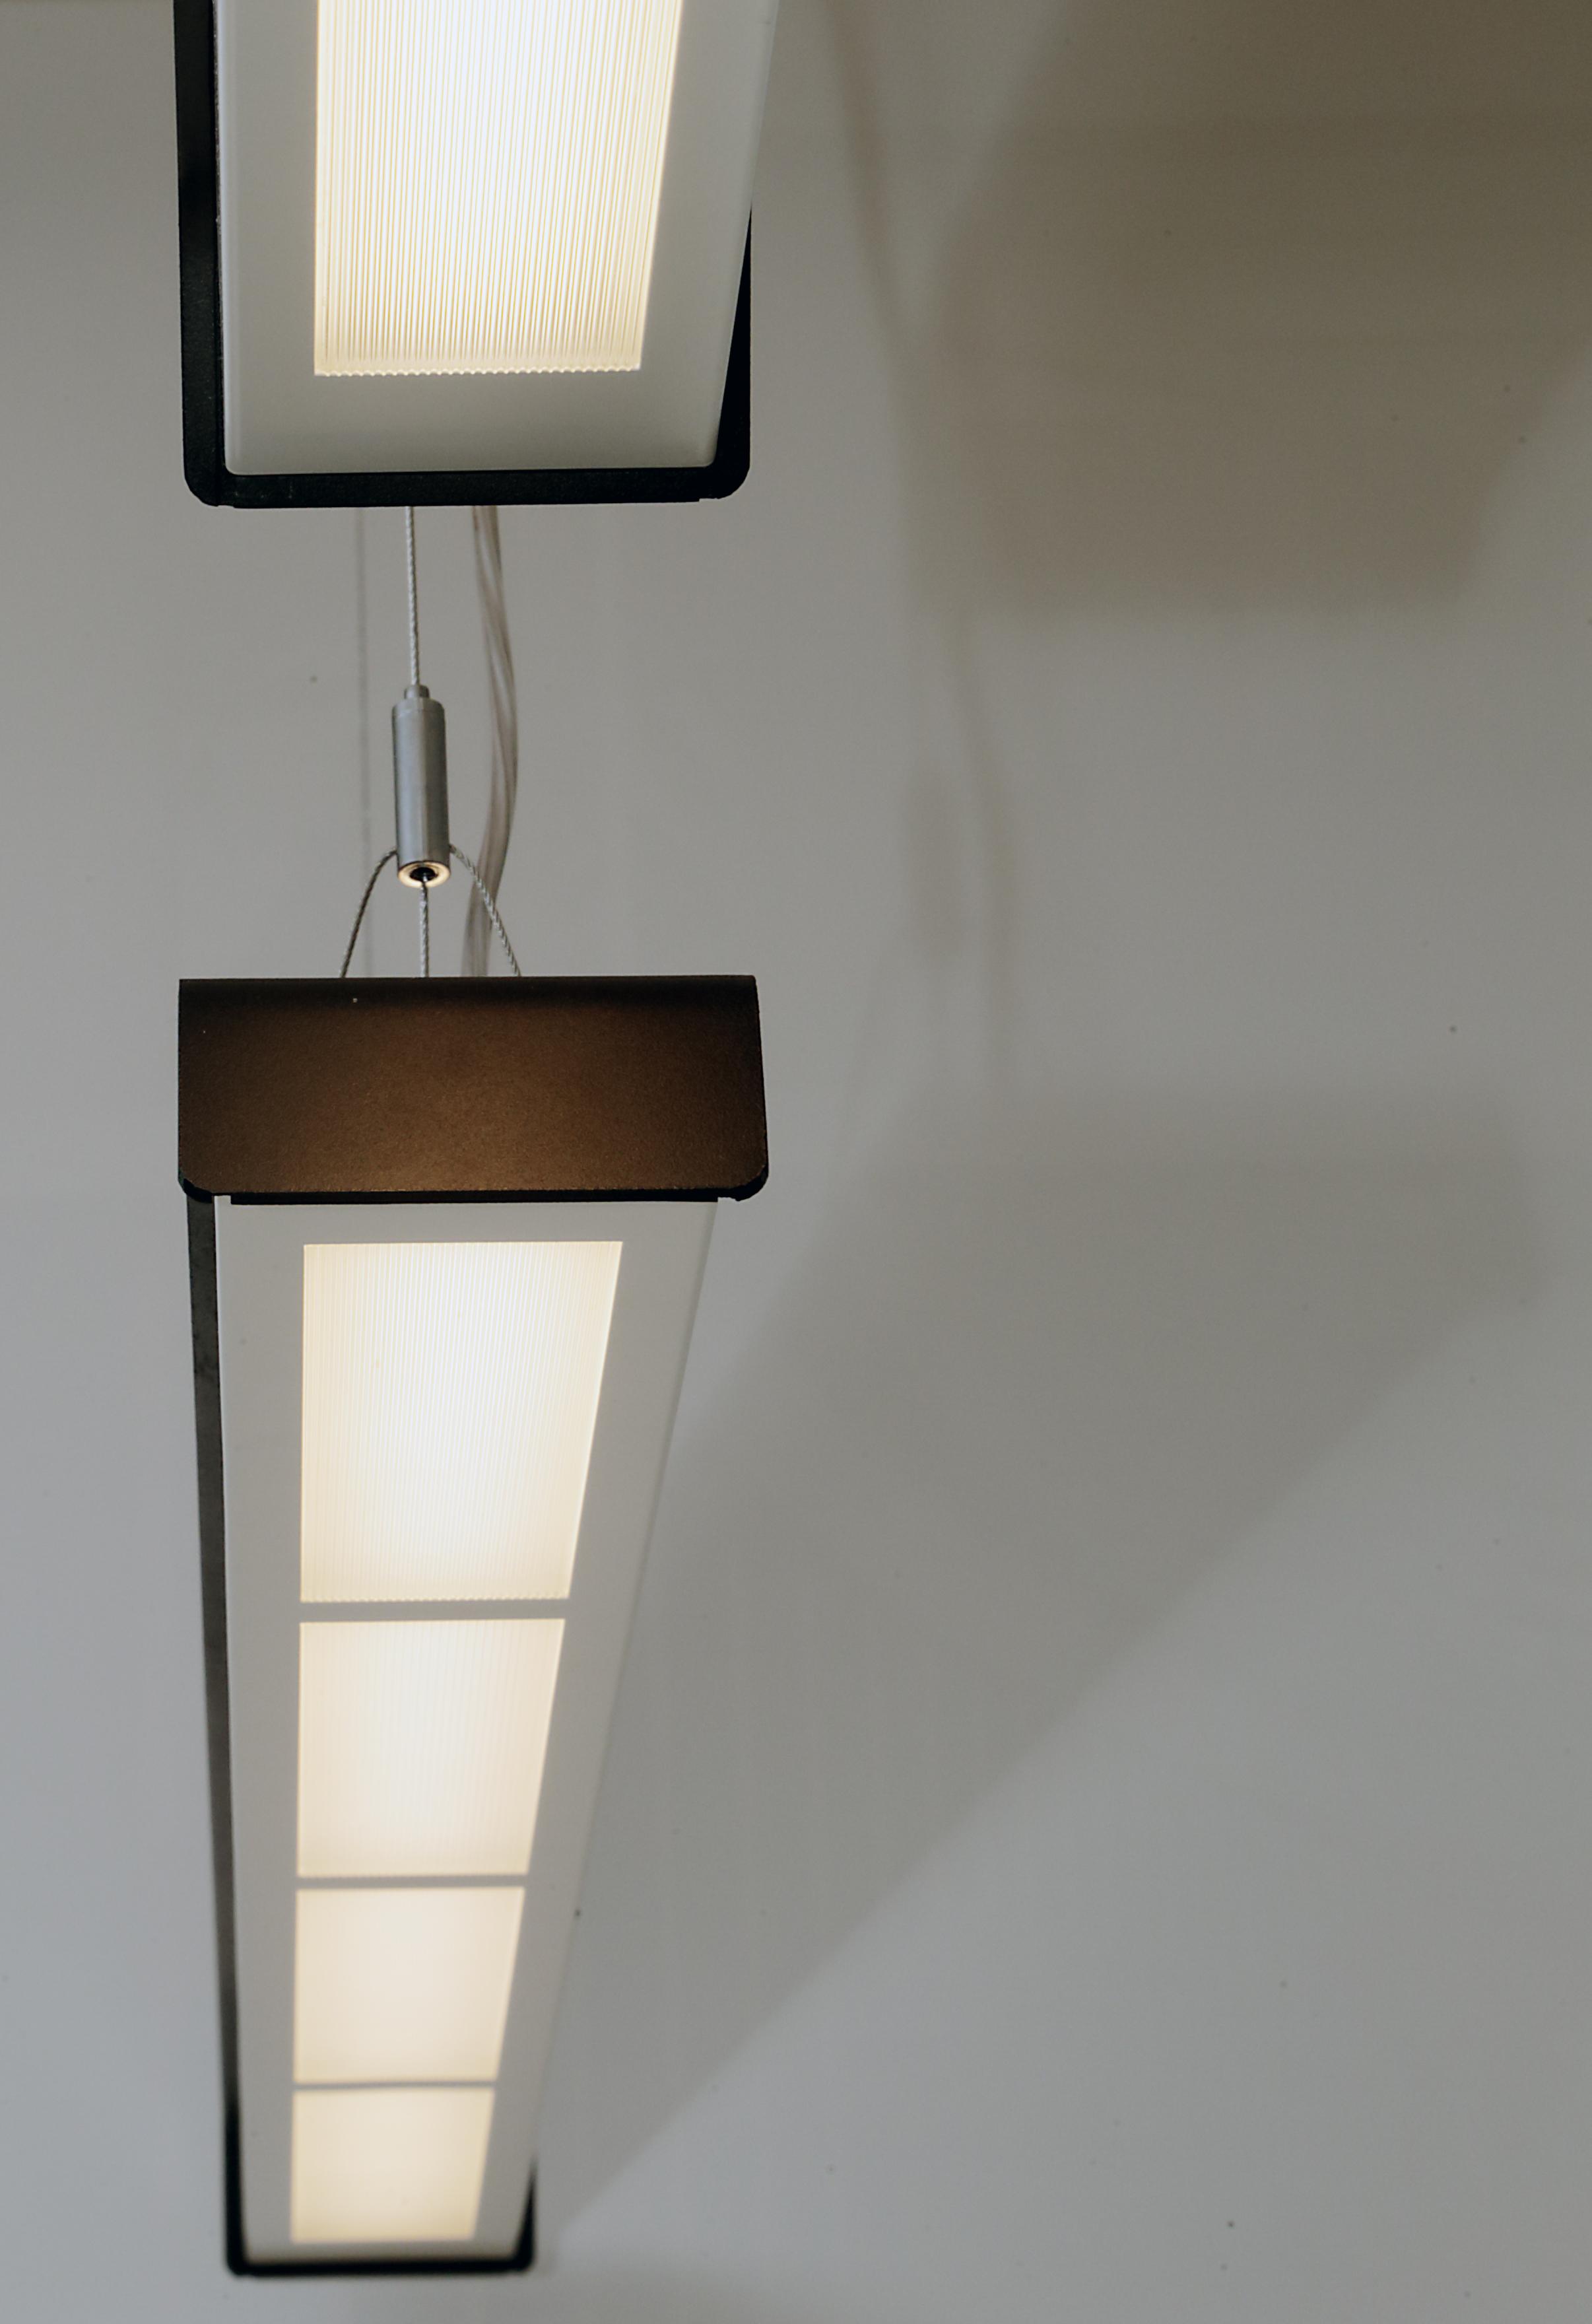 mutua pendelleuchte idee design licht. Black Bedroom Furniture Sets. Home Design Ideas